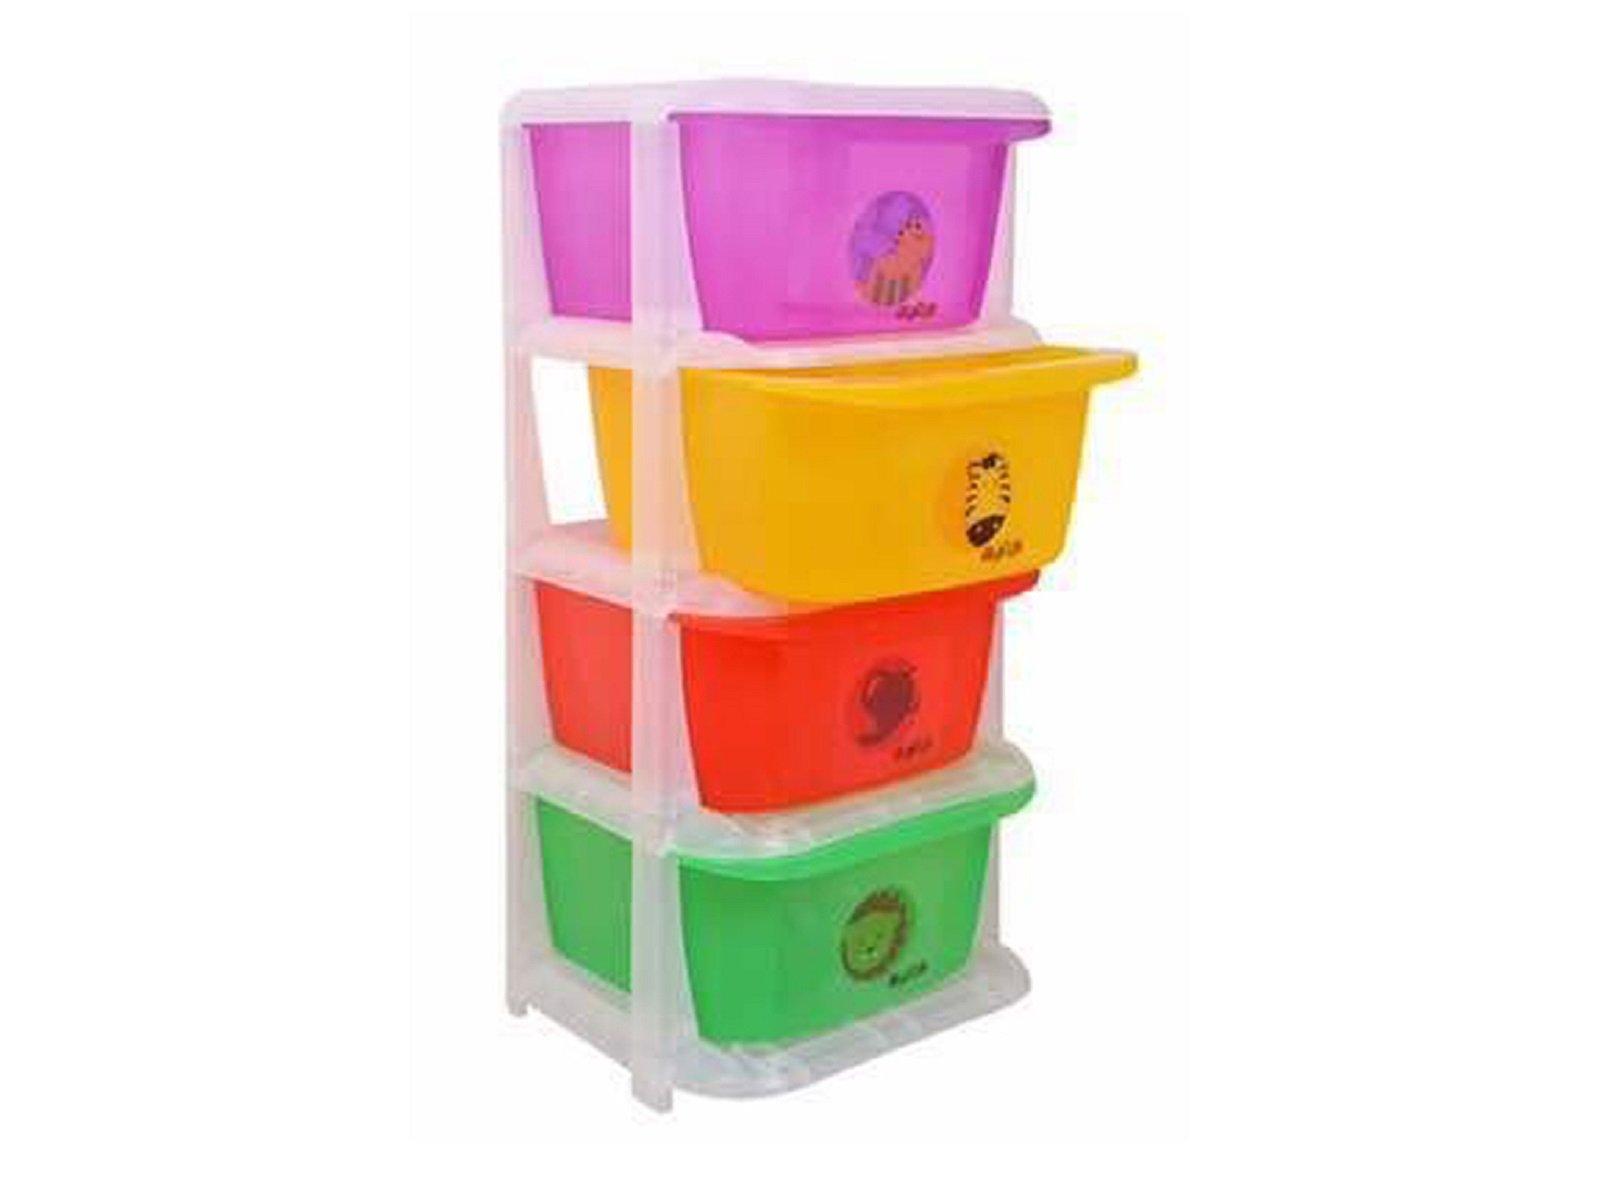 Kuber Industries Storage Drawers Basket for Kitchen/Office/Children/Toy With 4 Drawer in Moduler Design (Multiple usages) Basket007